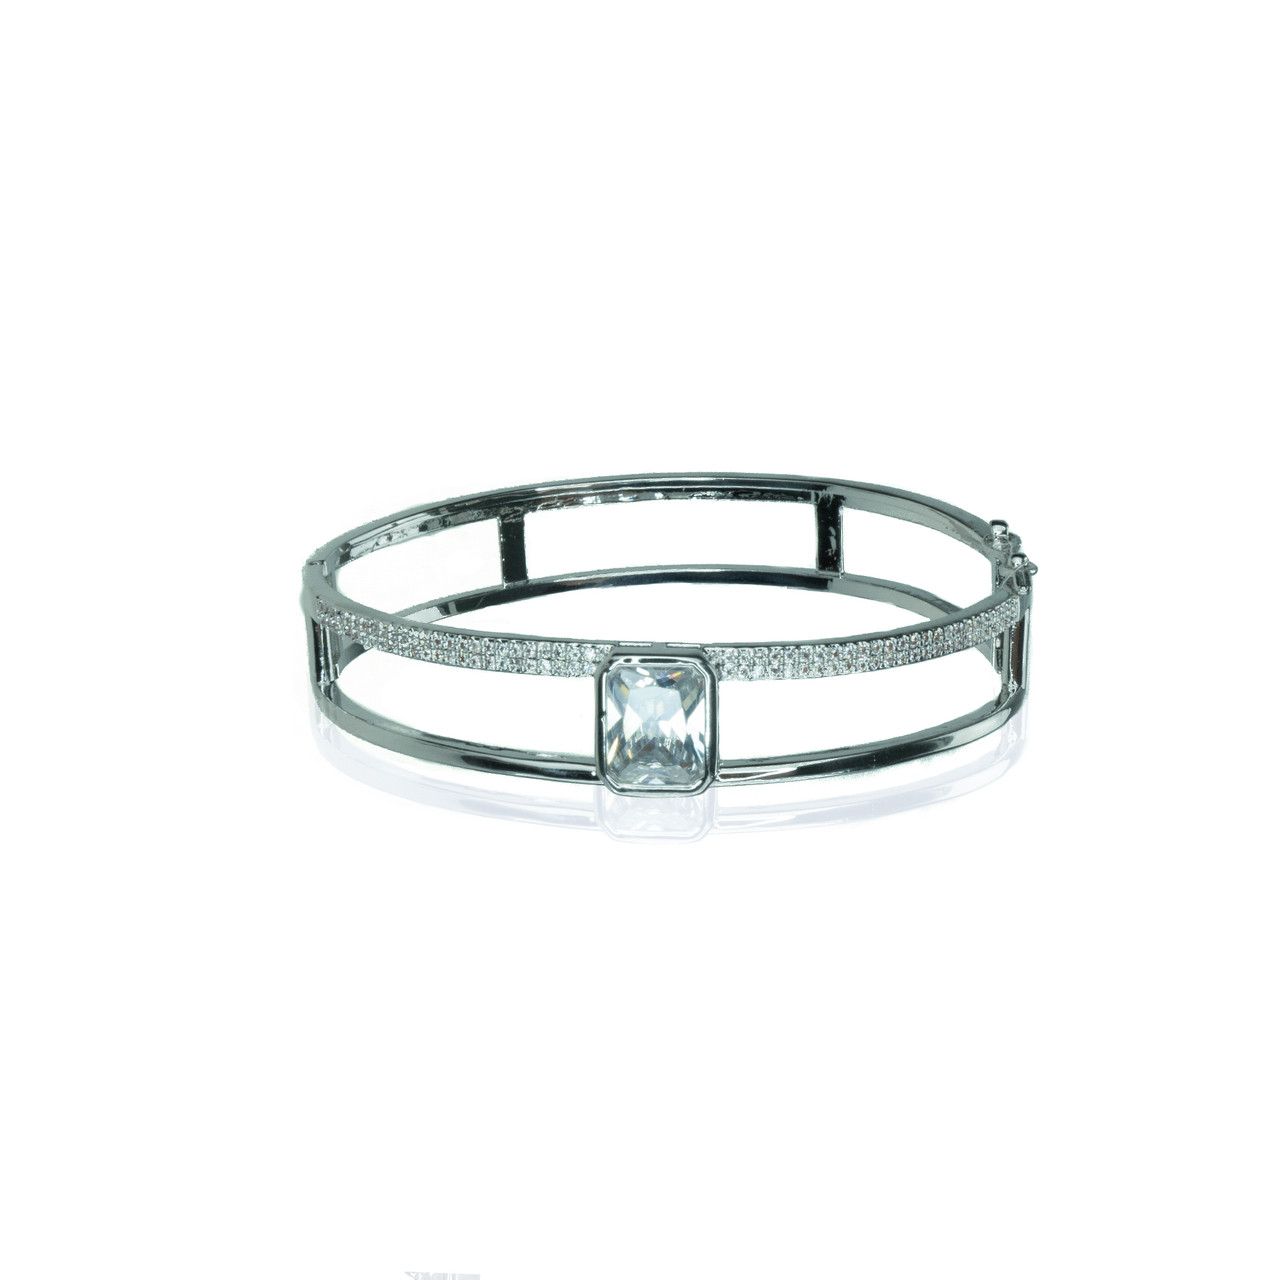 Bizhunet bracelet lux89